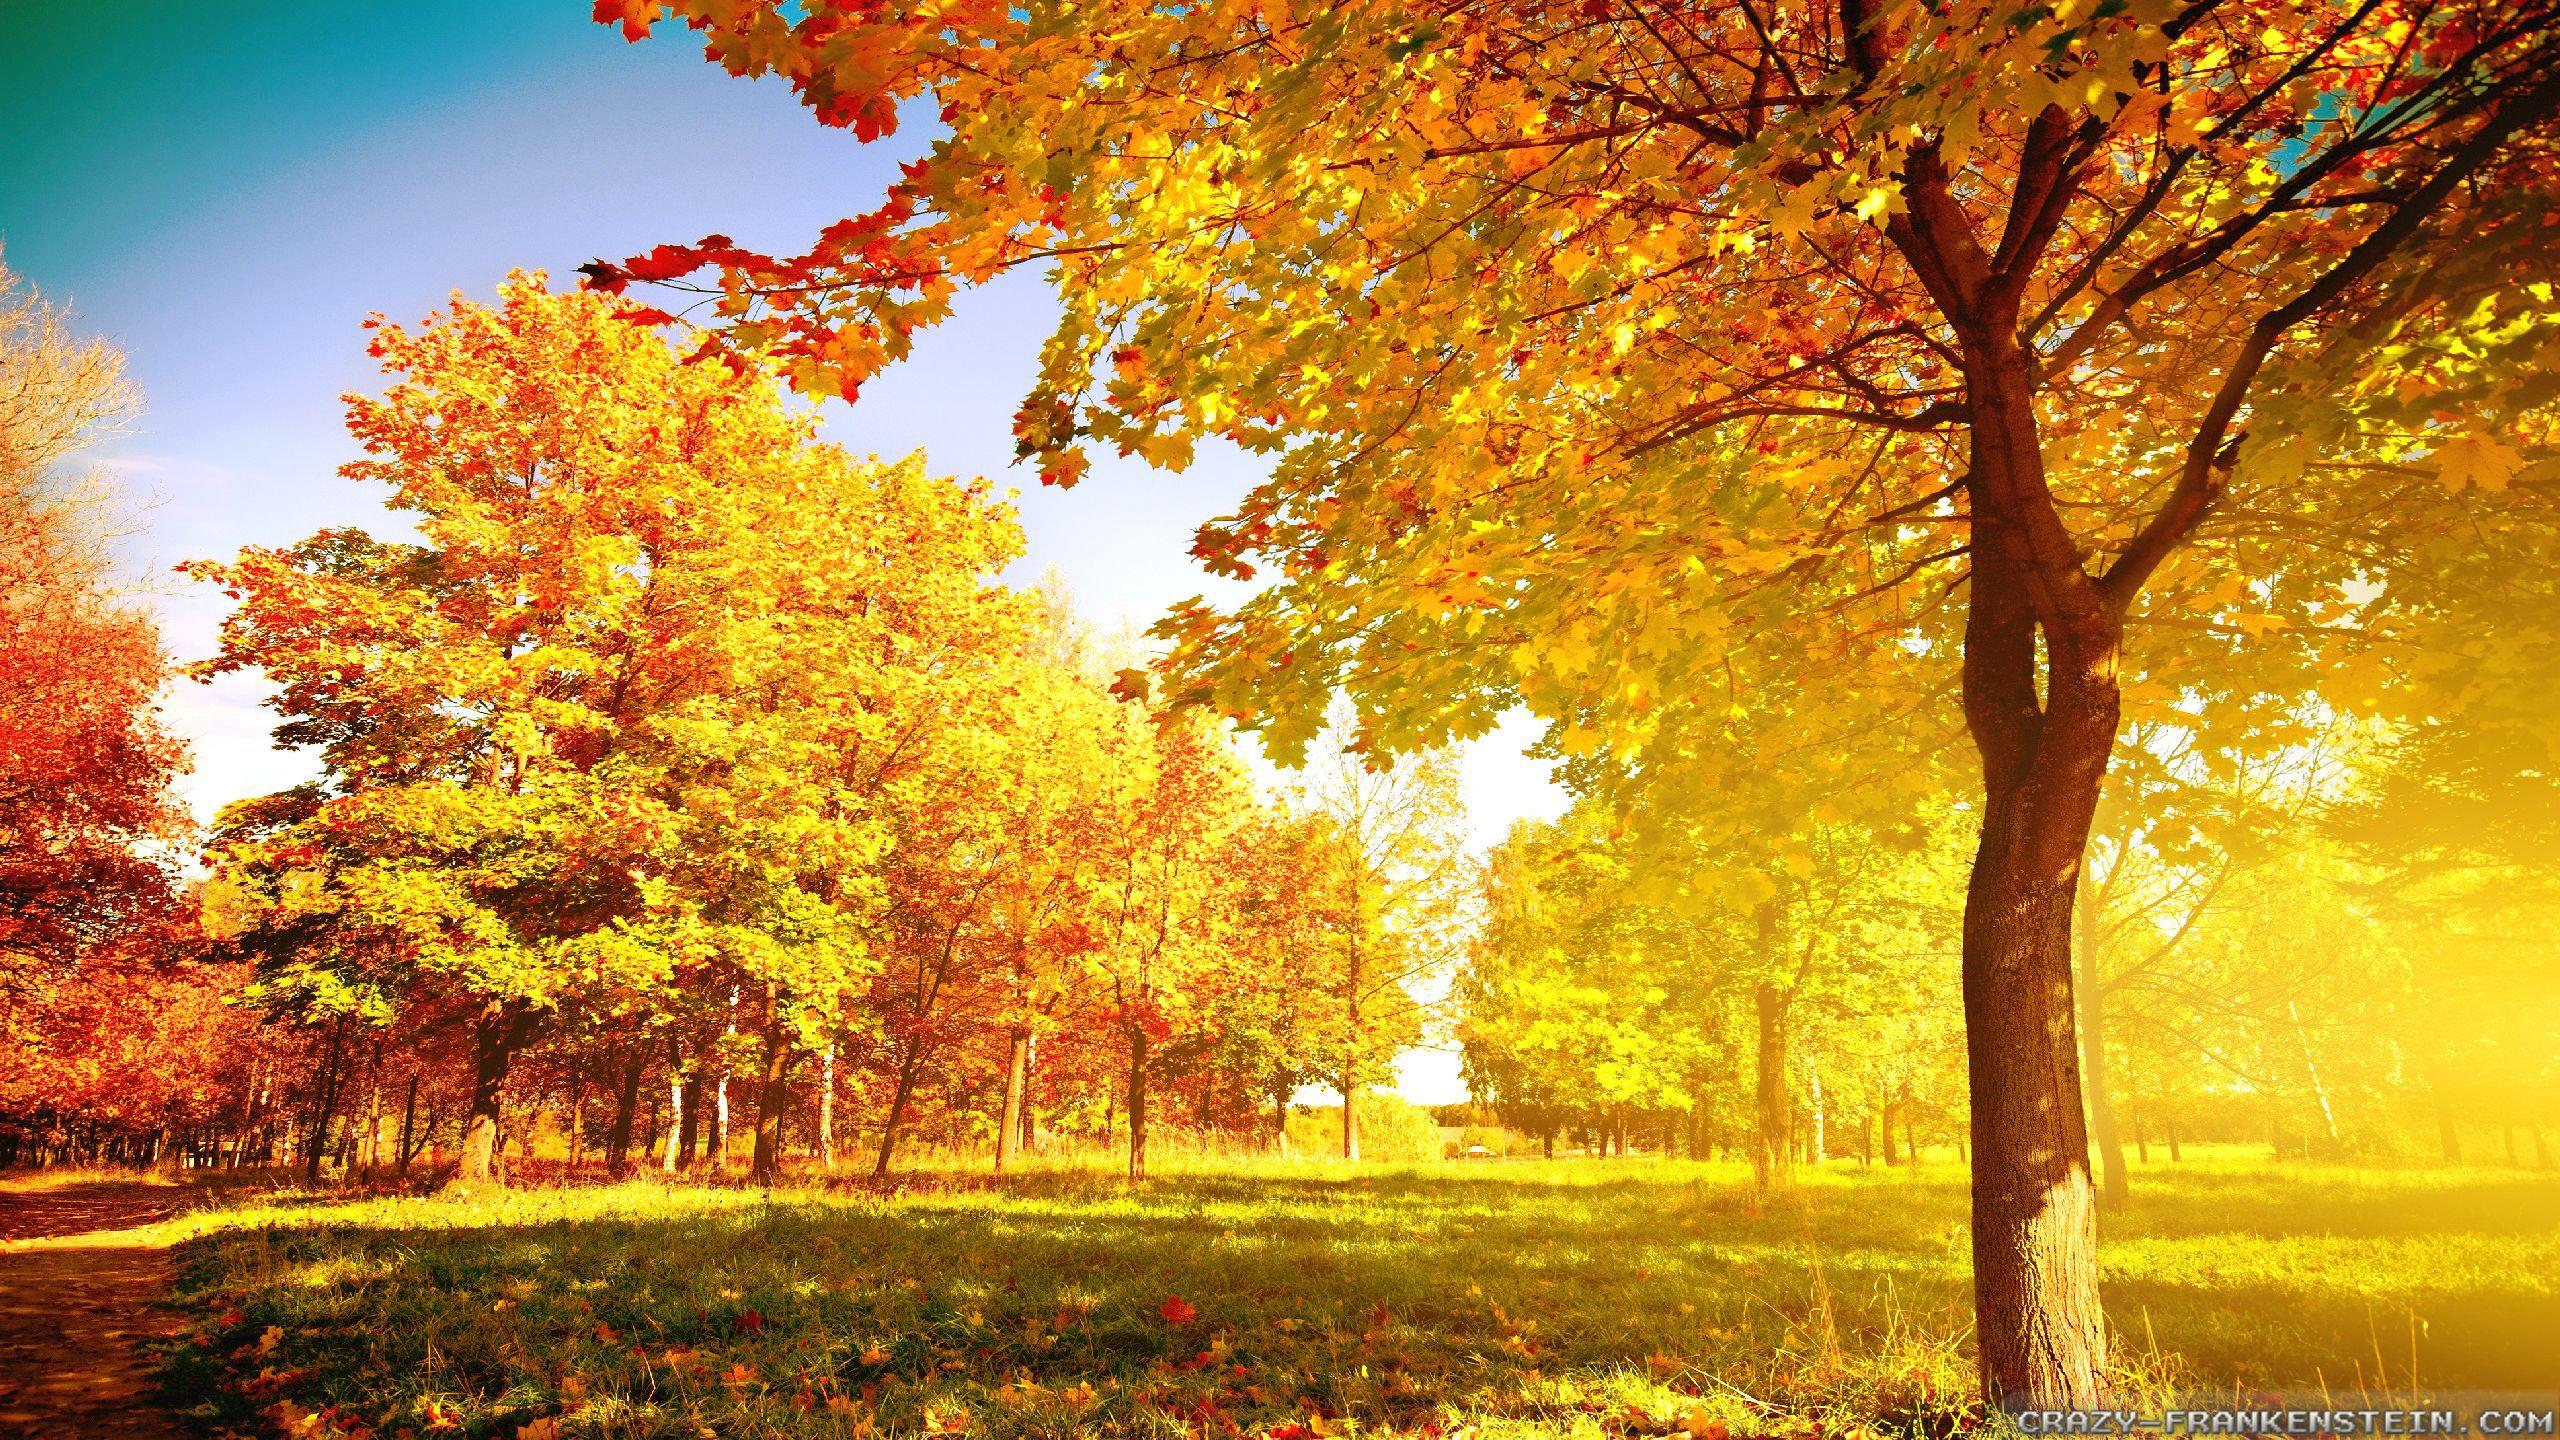 Autumn Tree Wallpaper HD Wallpapers Pulse 2560x1440